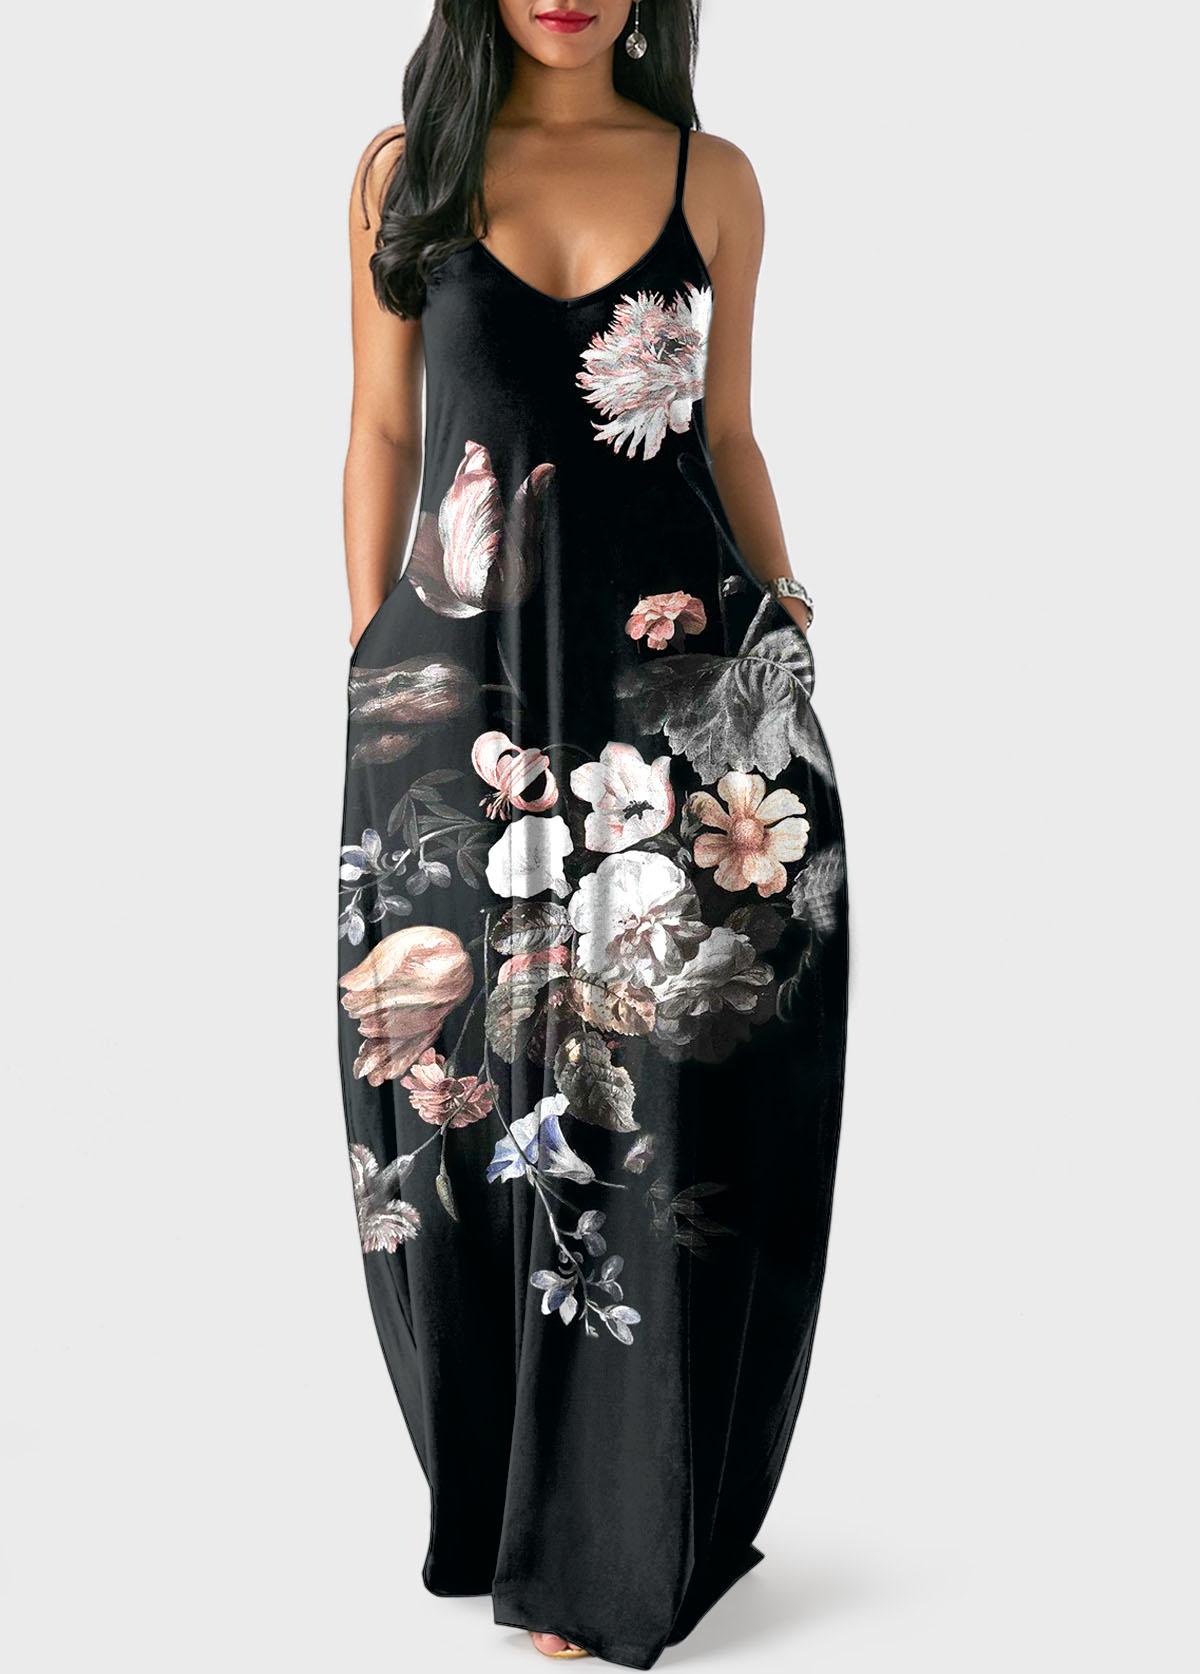 Spaghetti Strap Large Floral Print Black Dress